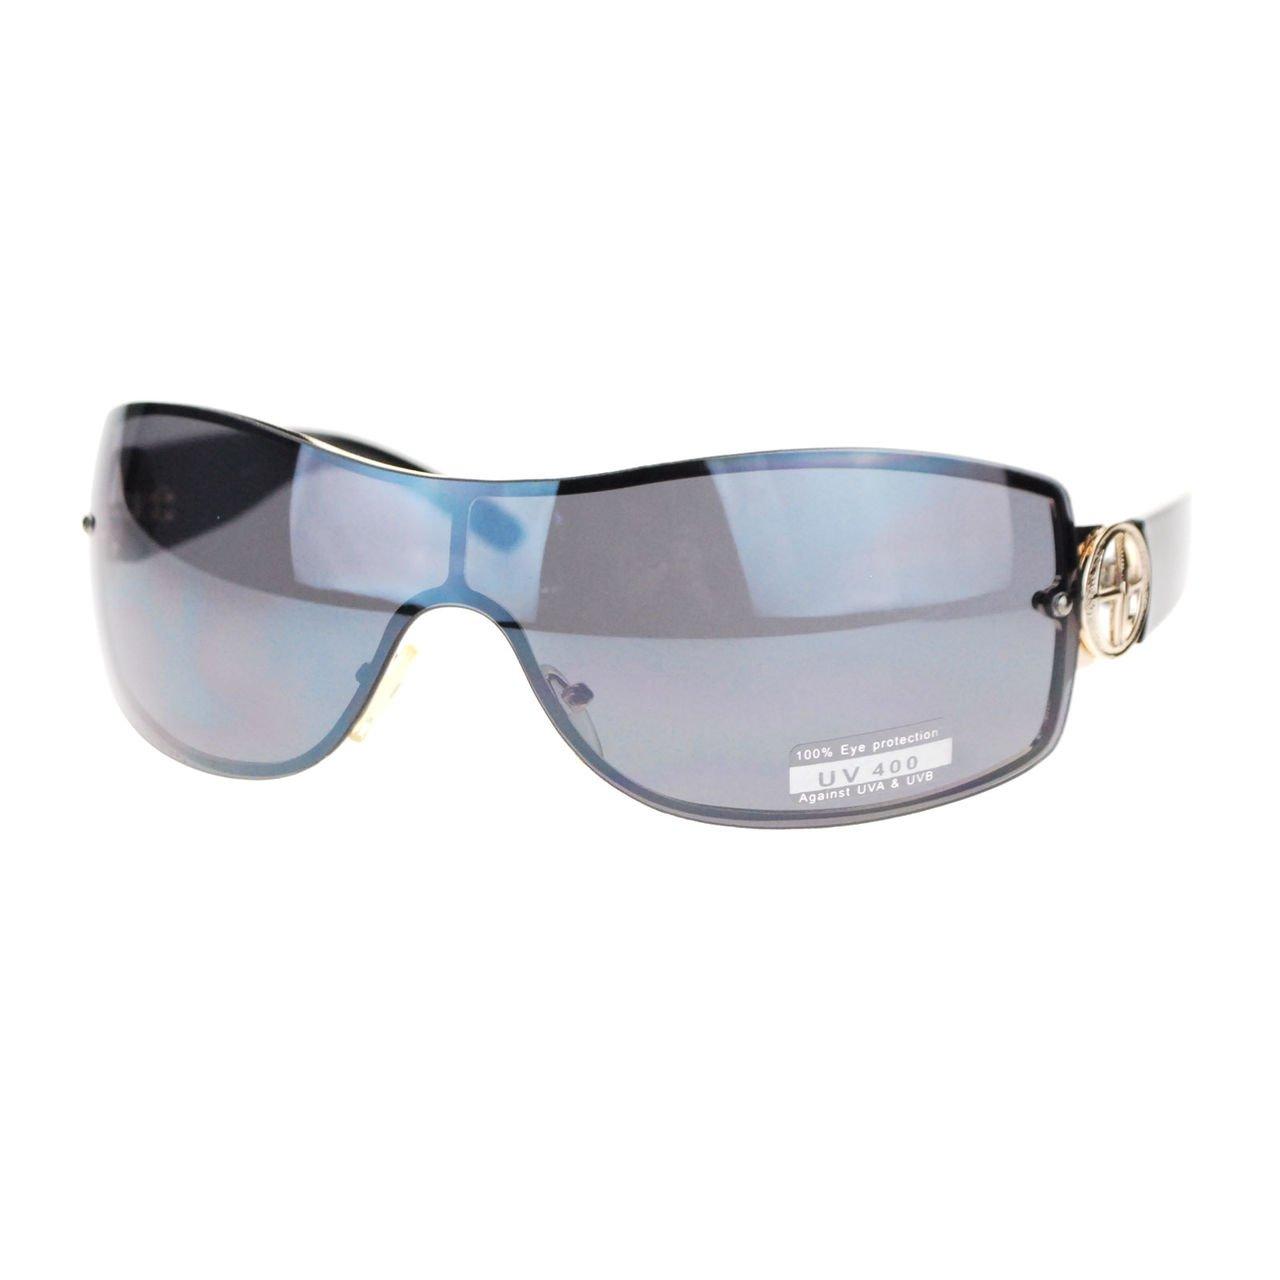 Womens Elegant Rimless Shield Warp Luxury Designer Sunglasses j9719-gdbrn-mf